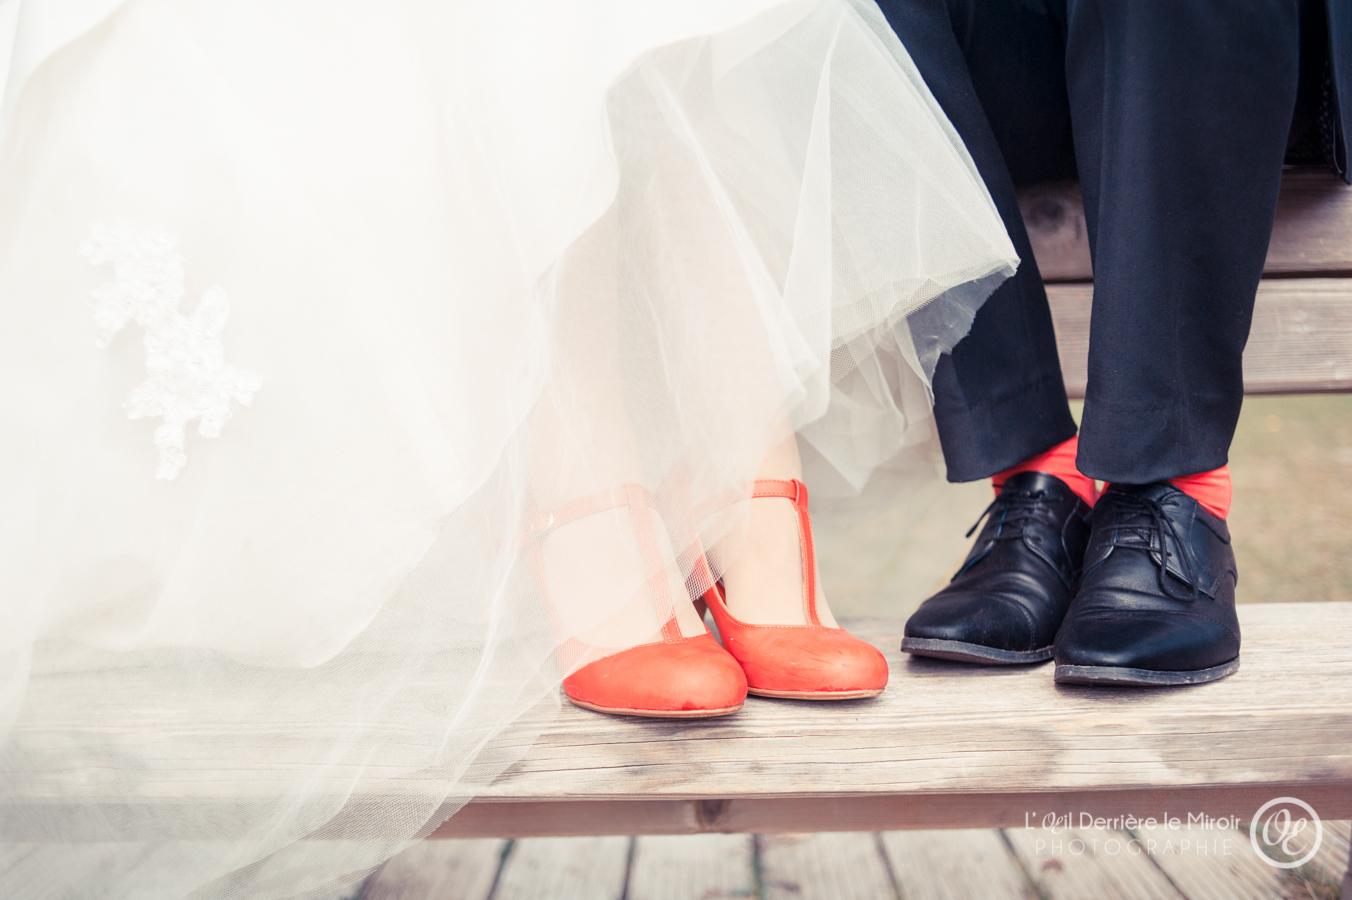 After-wedding-Audrey-Luis-loeilderrierelemiroir-38